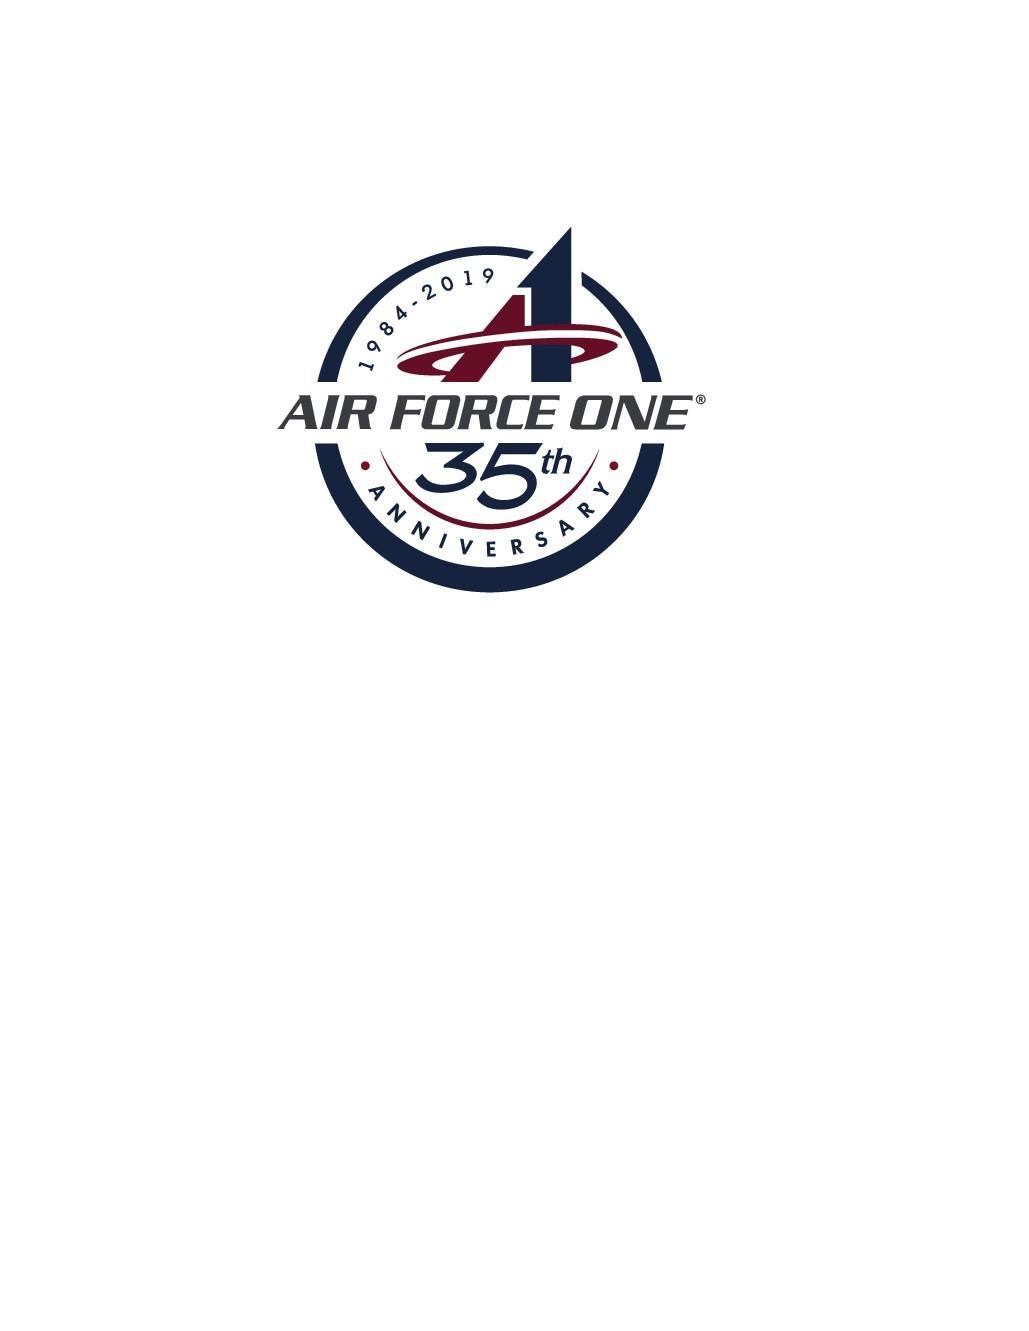 Air Force One 35th Anniversary Logo